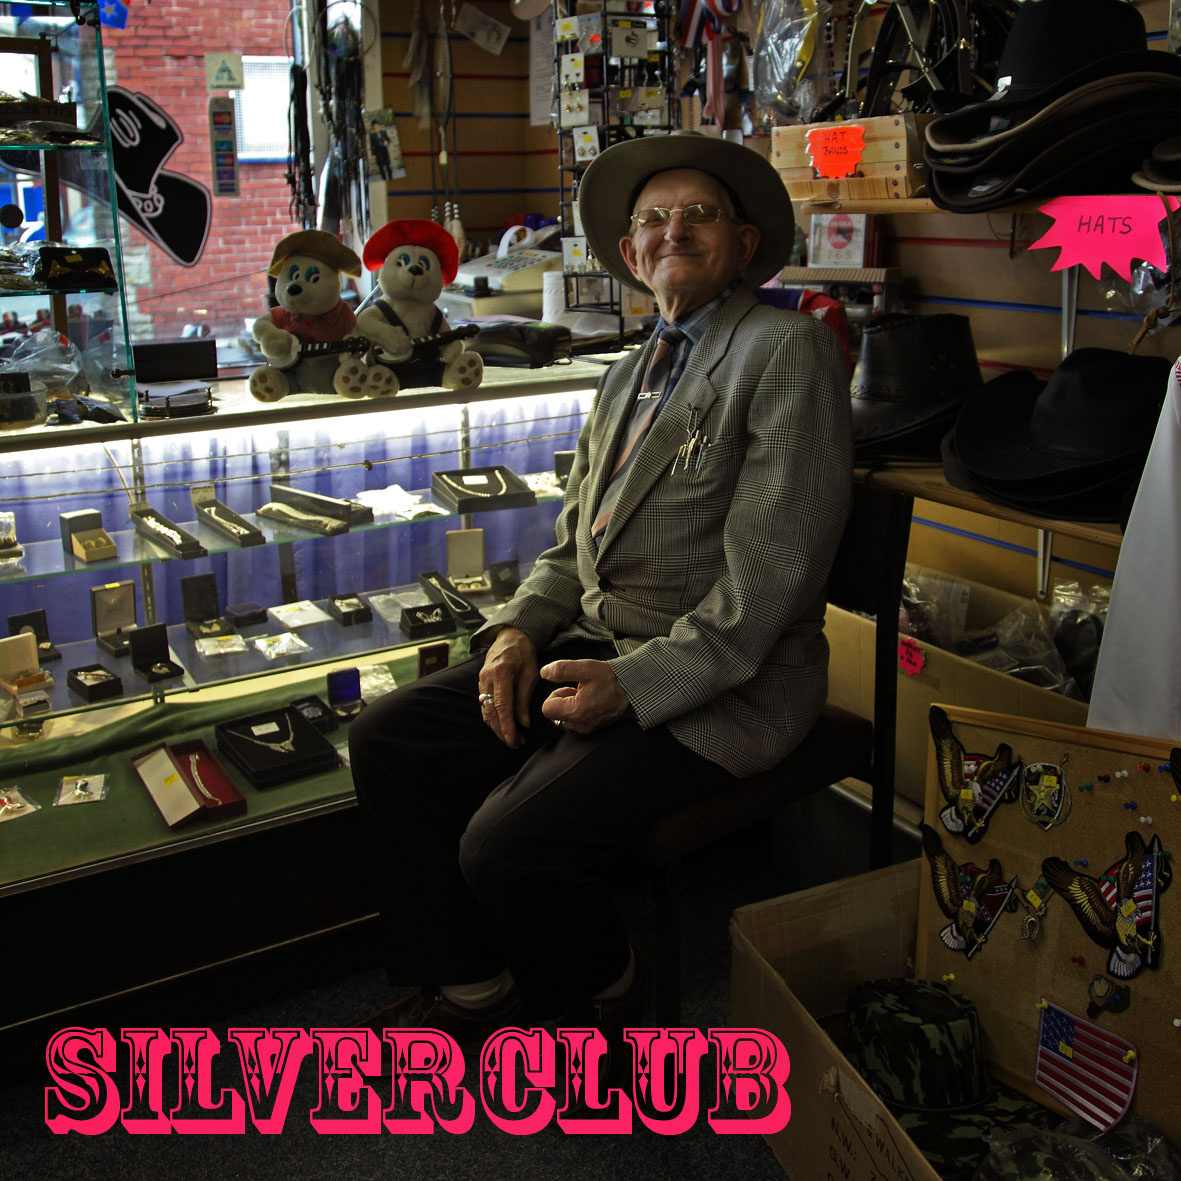 """Silverclub"" collection"